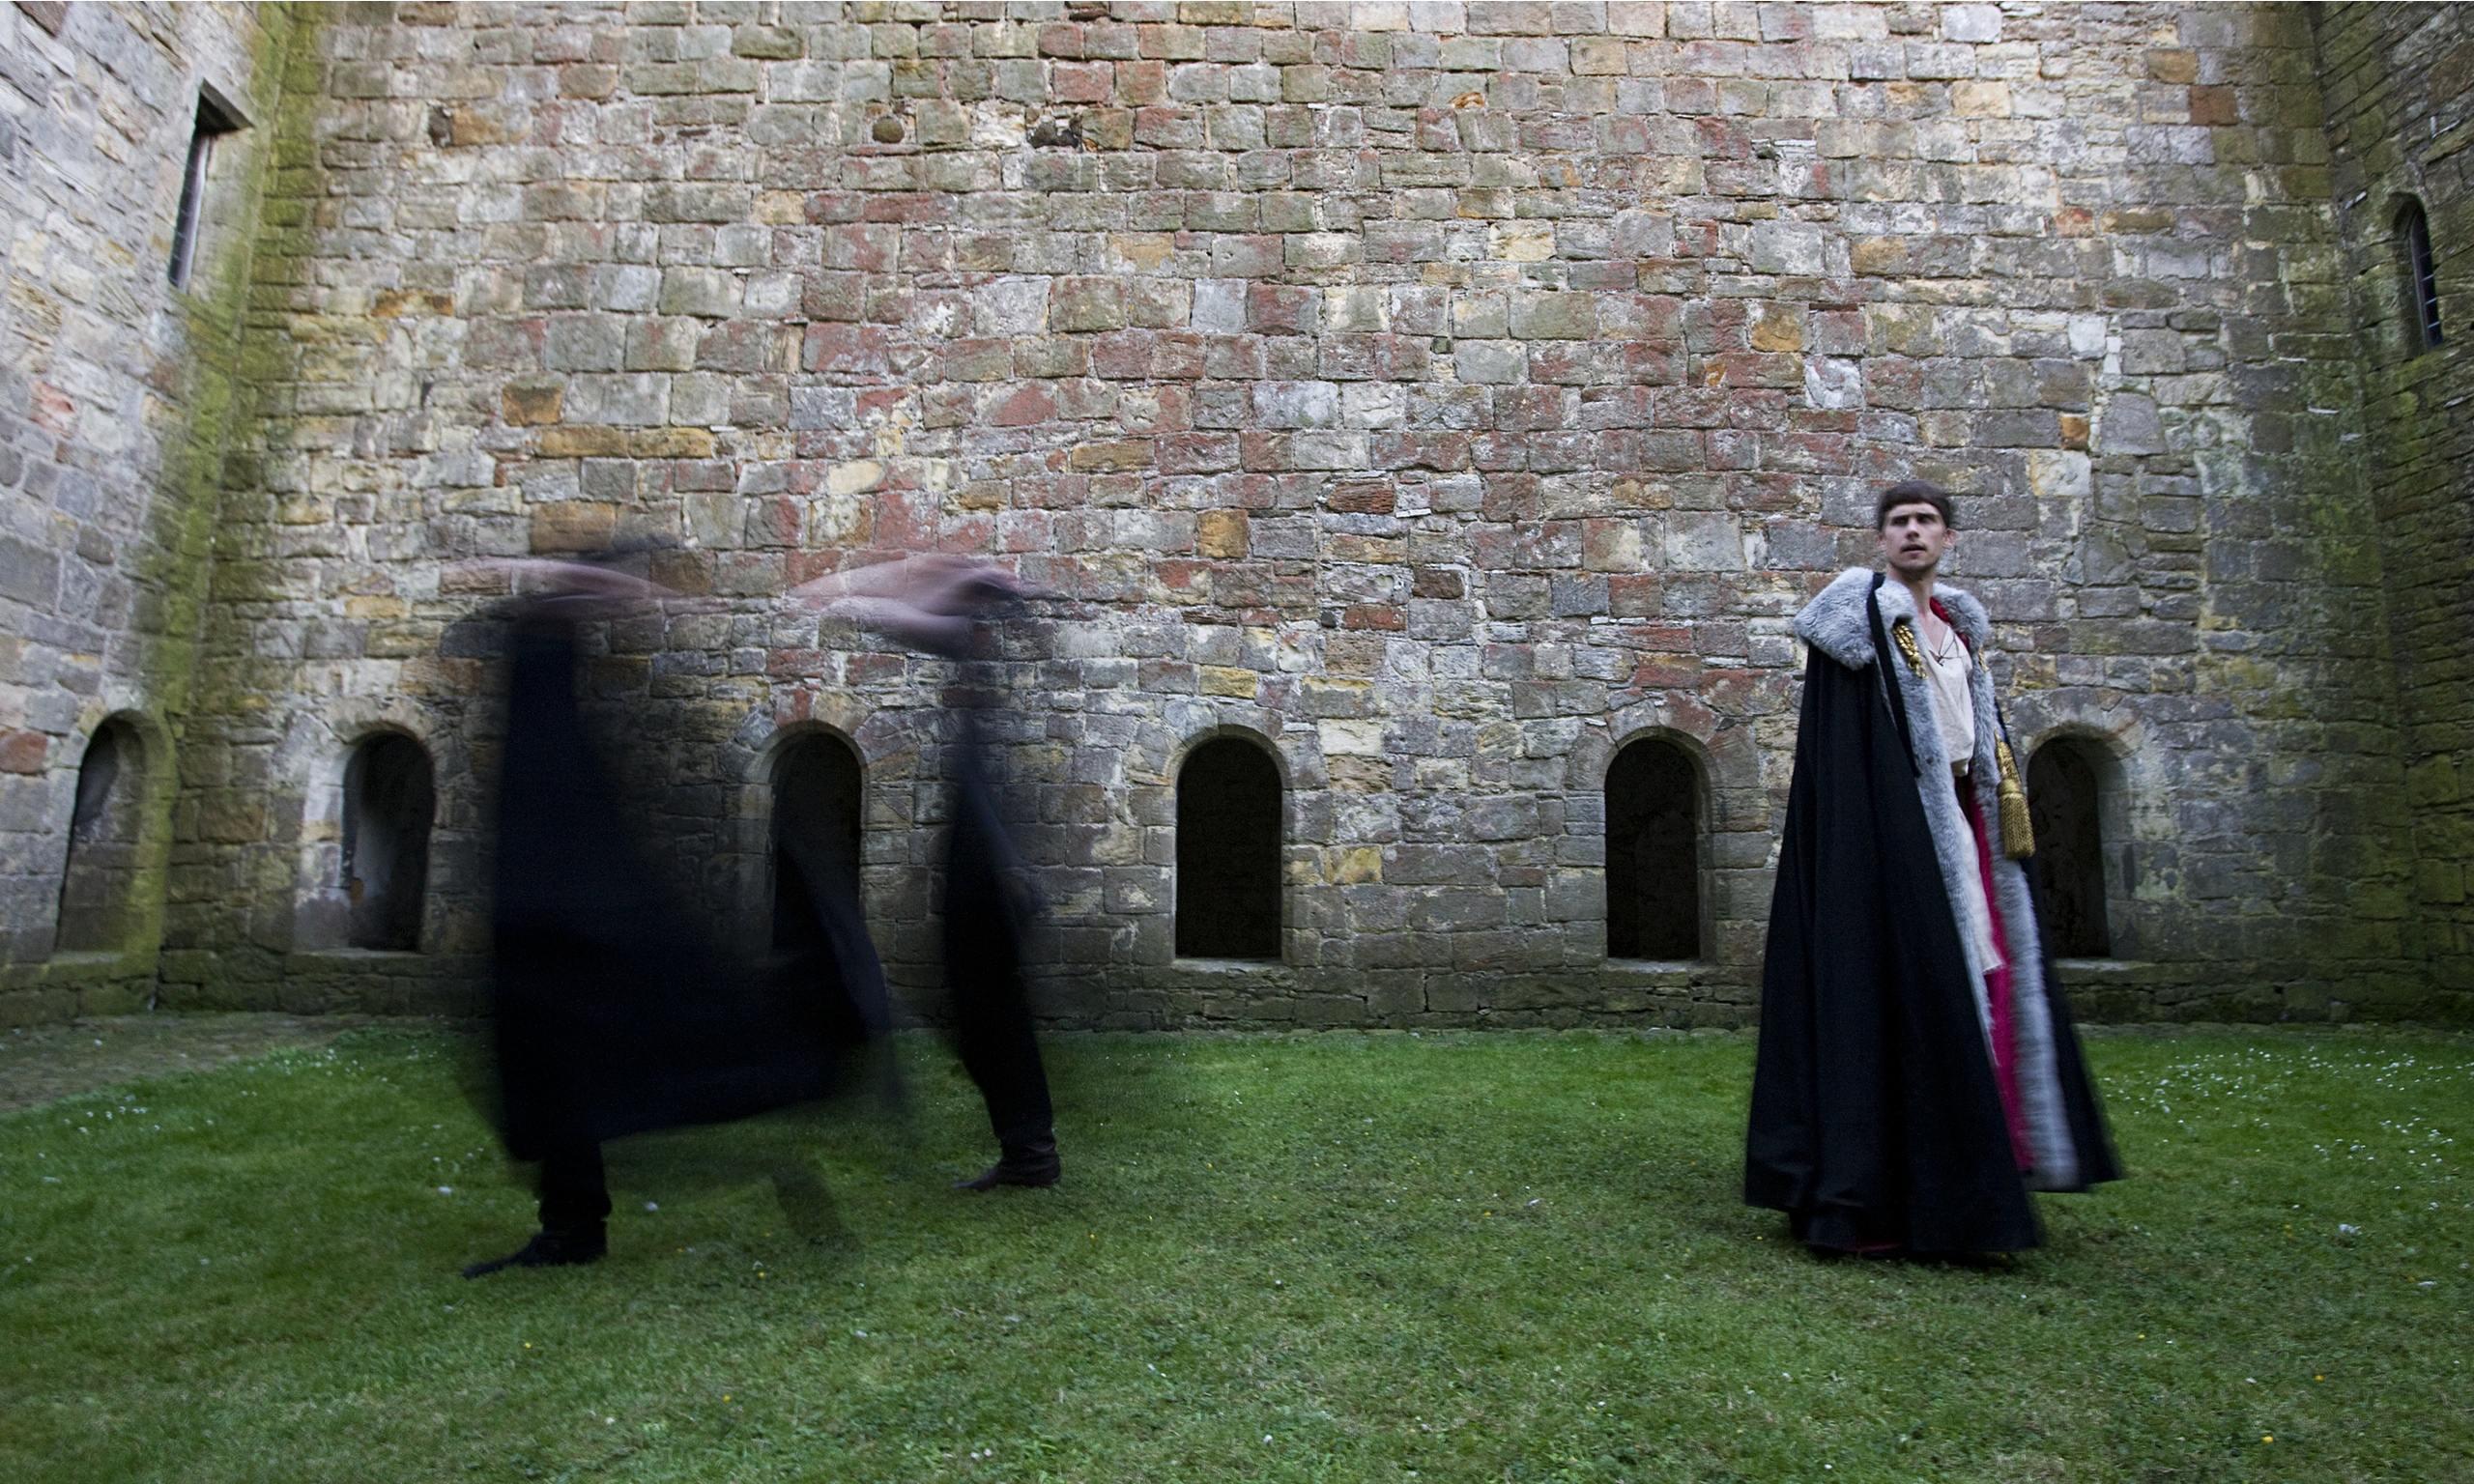 interpretations with shakespearean drama Though shakespearean adaptations geared specifically for children have been   that readers see distinct and unique interpretations of shakespeare's drama.